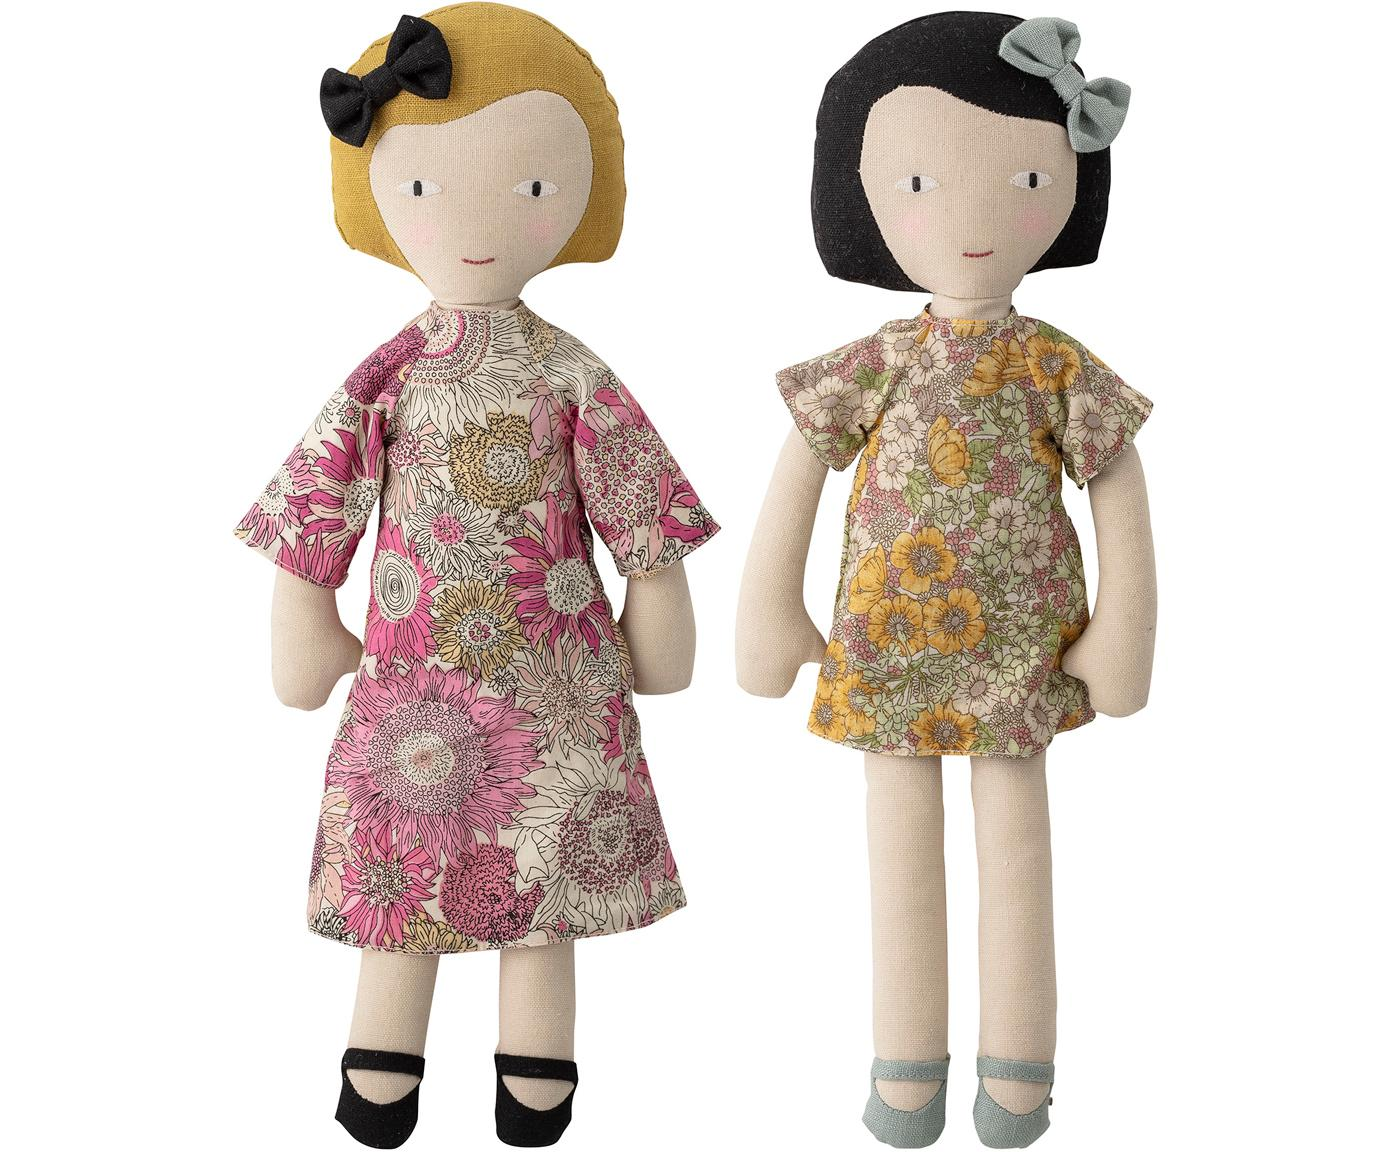 Set de muñecas, 2pzas., Tapizado: 65% poliéster, 35% algodó, Multicolor, An 10 x Al 36 cm